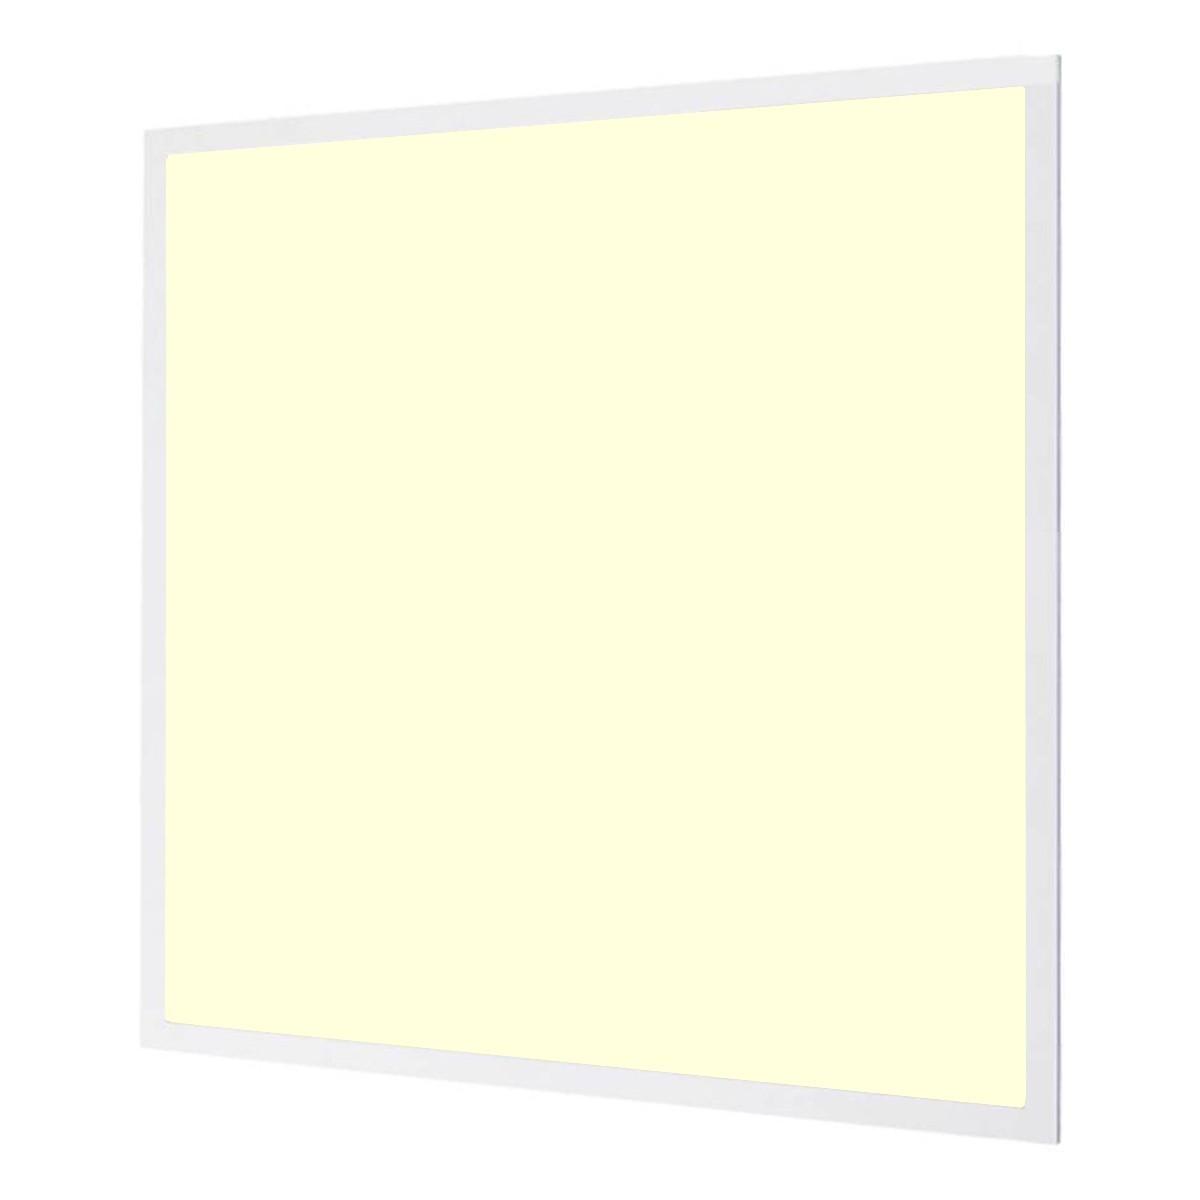 LED Paneel - Aigi - Dimbaar - 60x60 - Warm Wit 3000K - 40W Inbouw Vierkant - Inclusief Stekker - Mat Wit - Flikkervrij